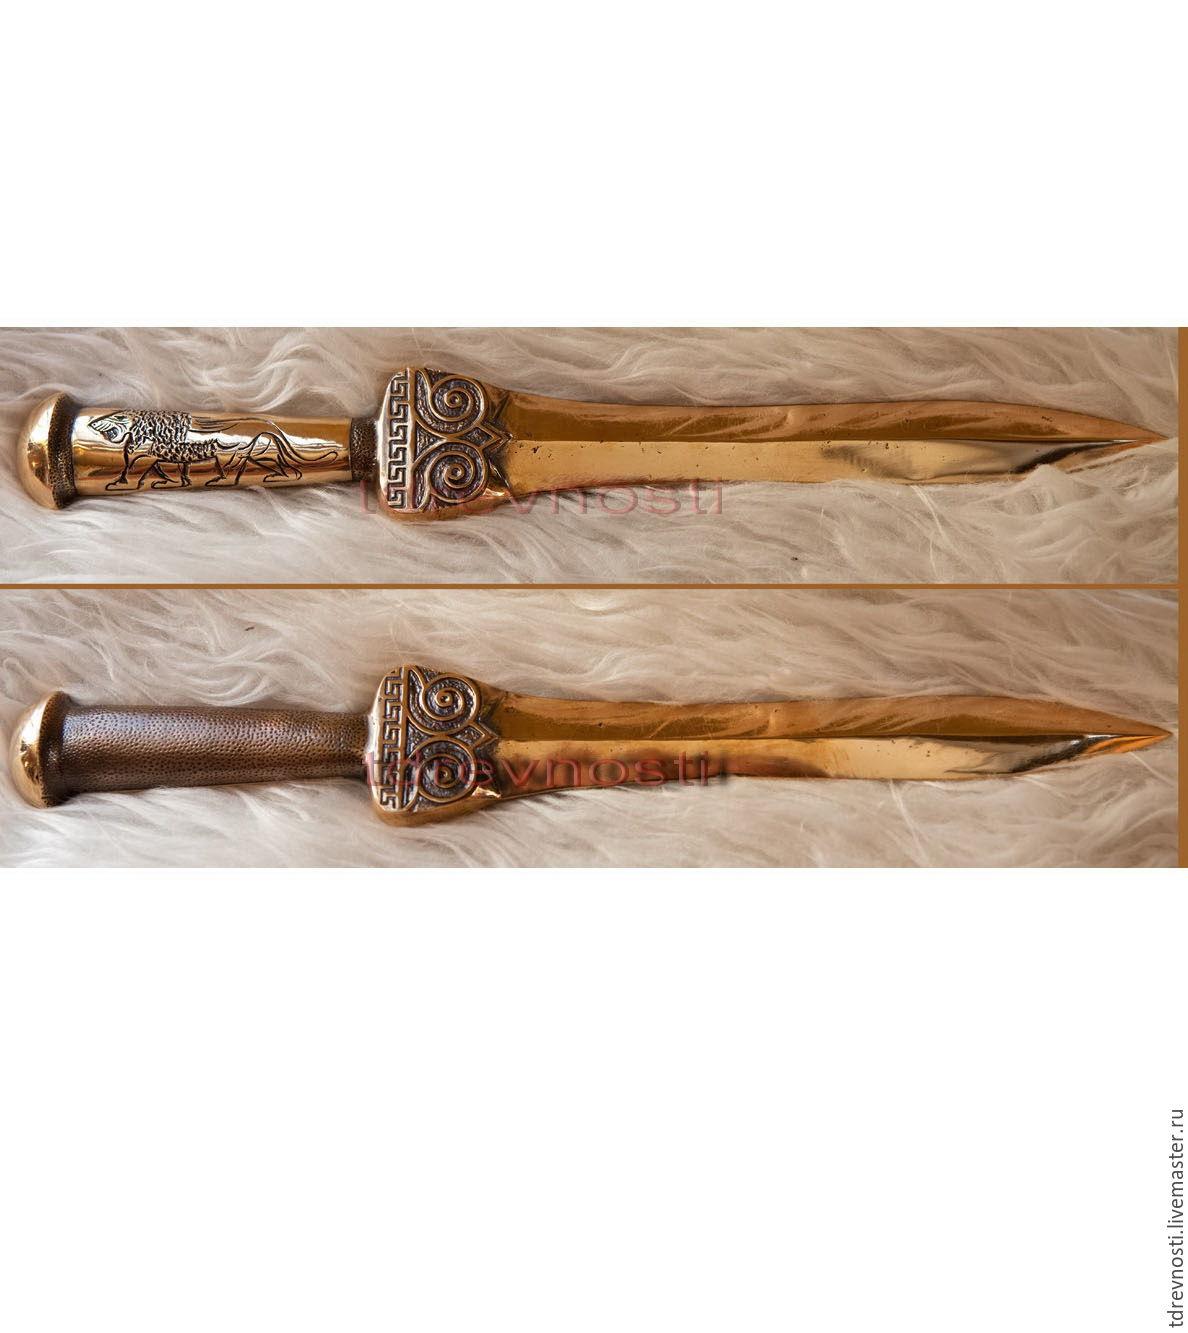 Mycenaean bronze sword.Dagger, Souvenir weapon, Novosibirsk,  Фото №1